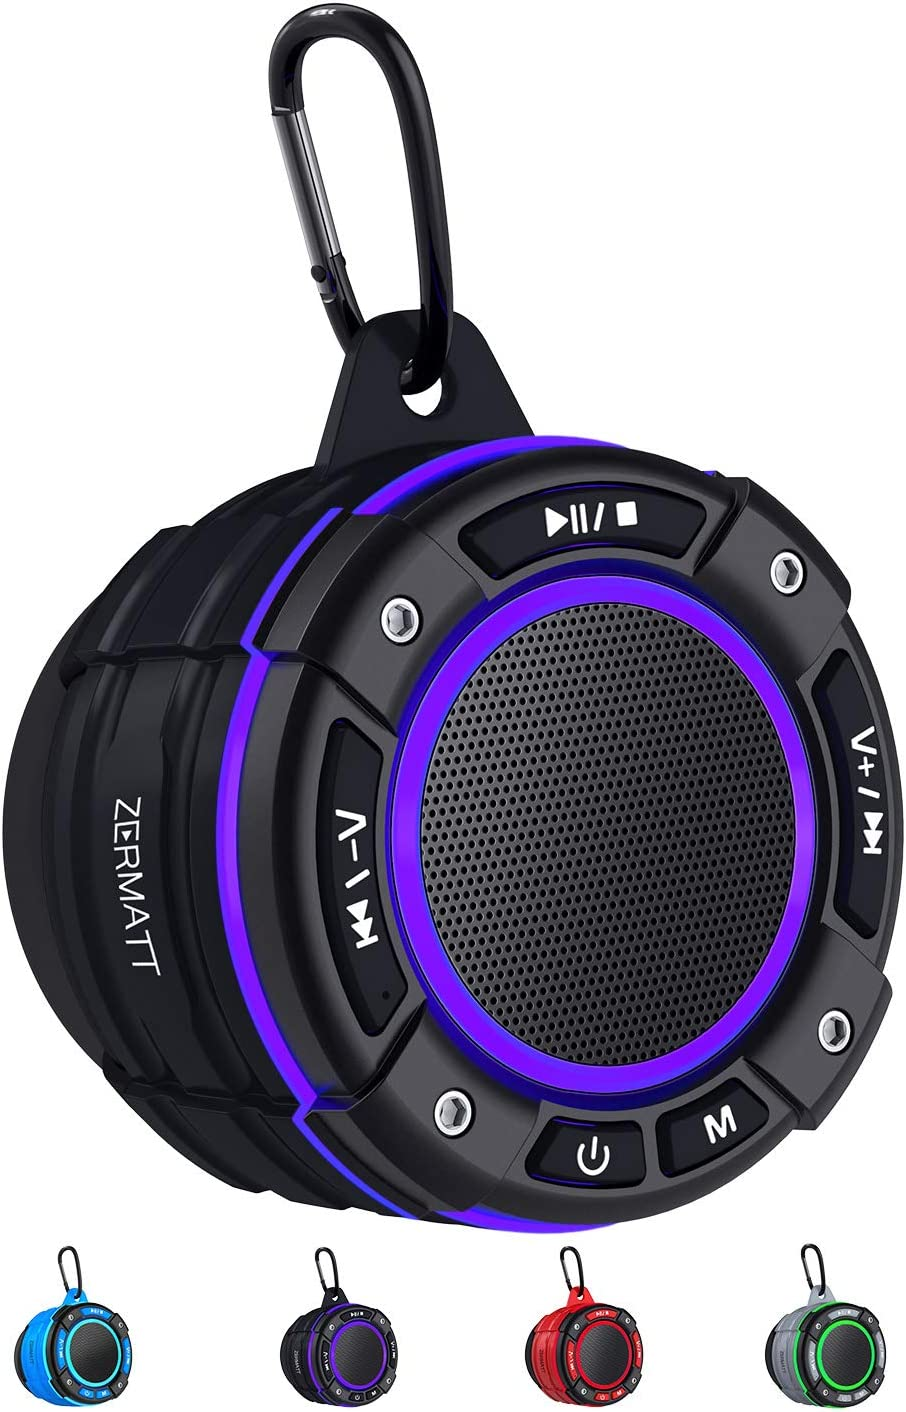 Free Amazon Promo Code 2020 for Waterproof Portable Wireless Bluetooth Speaker